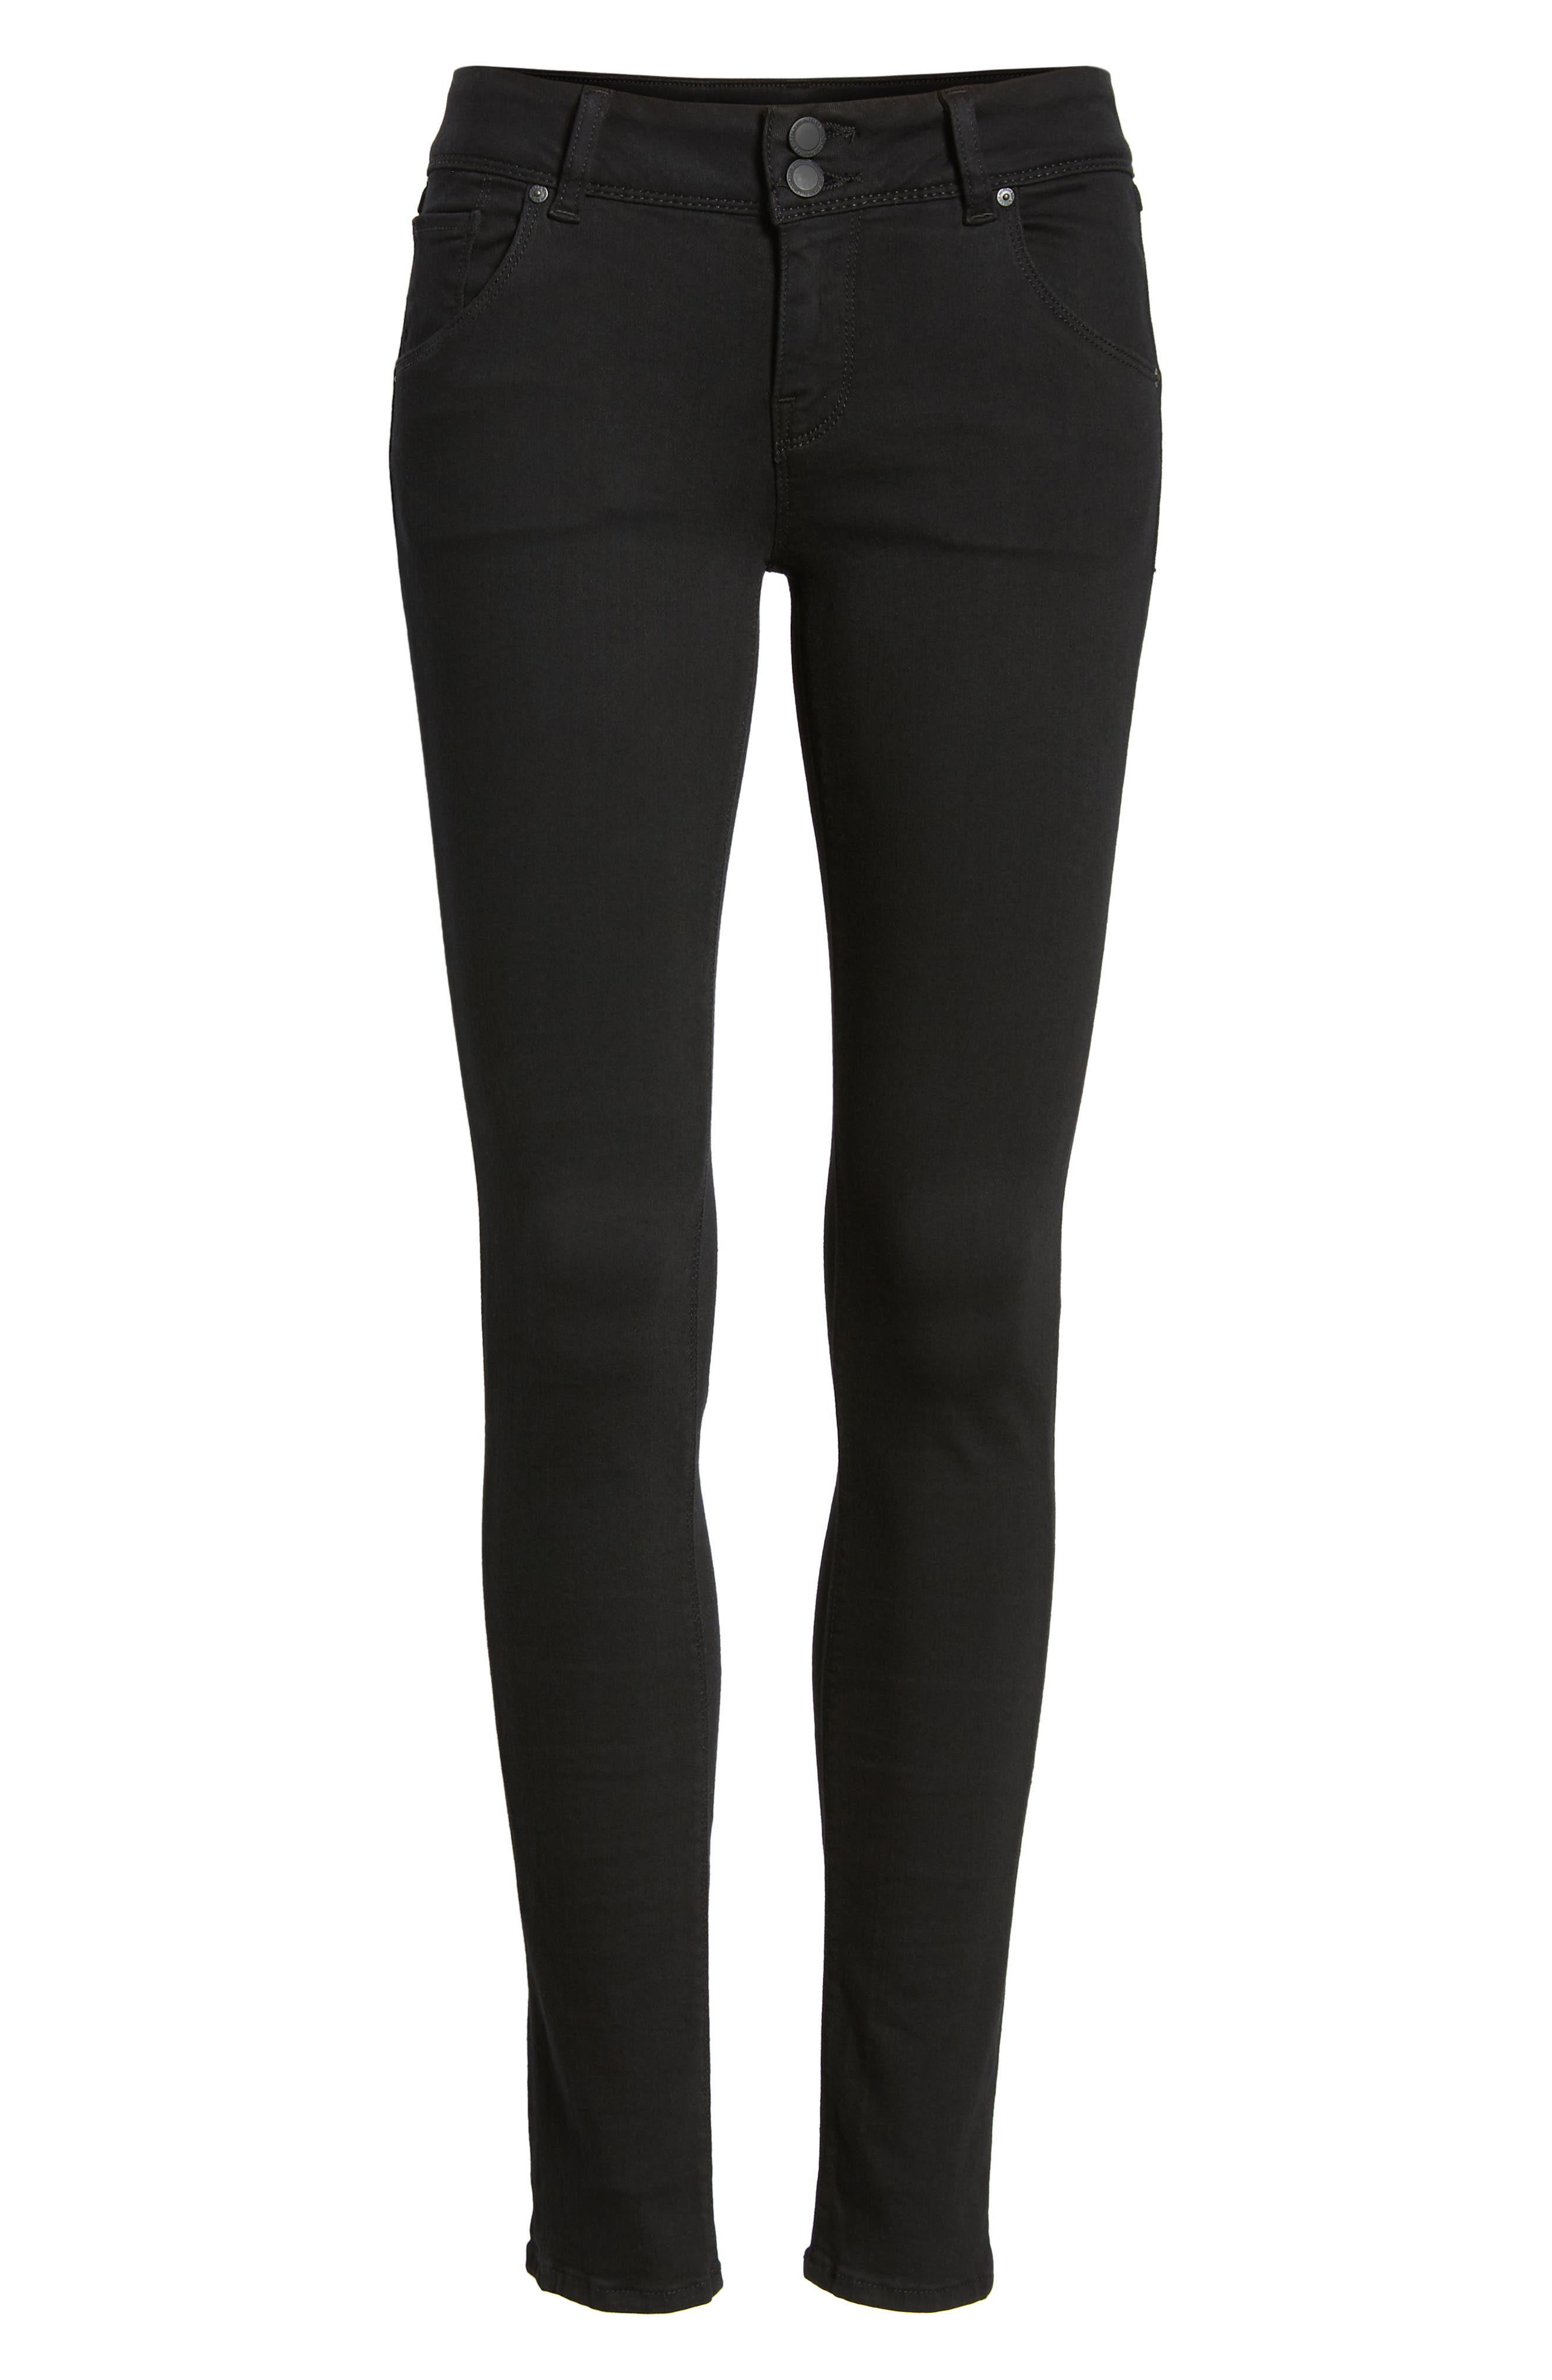 Collin Skinny Jeans,                             Alternate thumbnail 7, color,                             BLACK